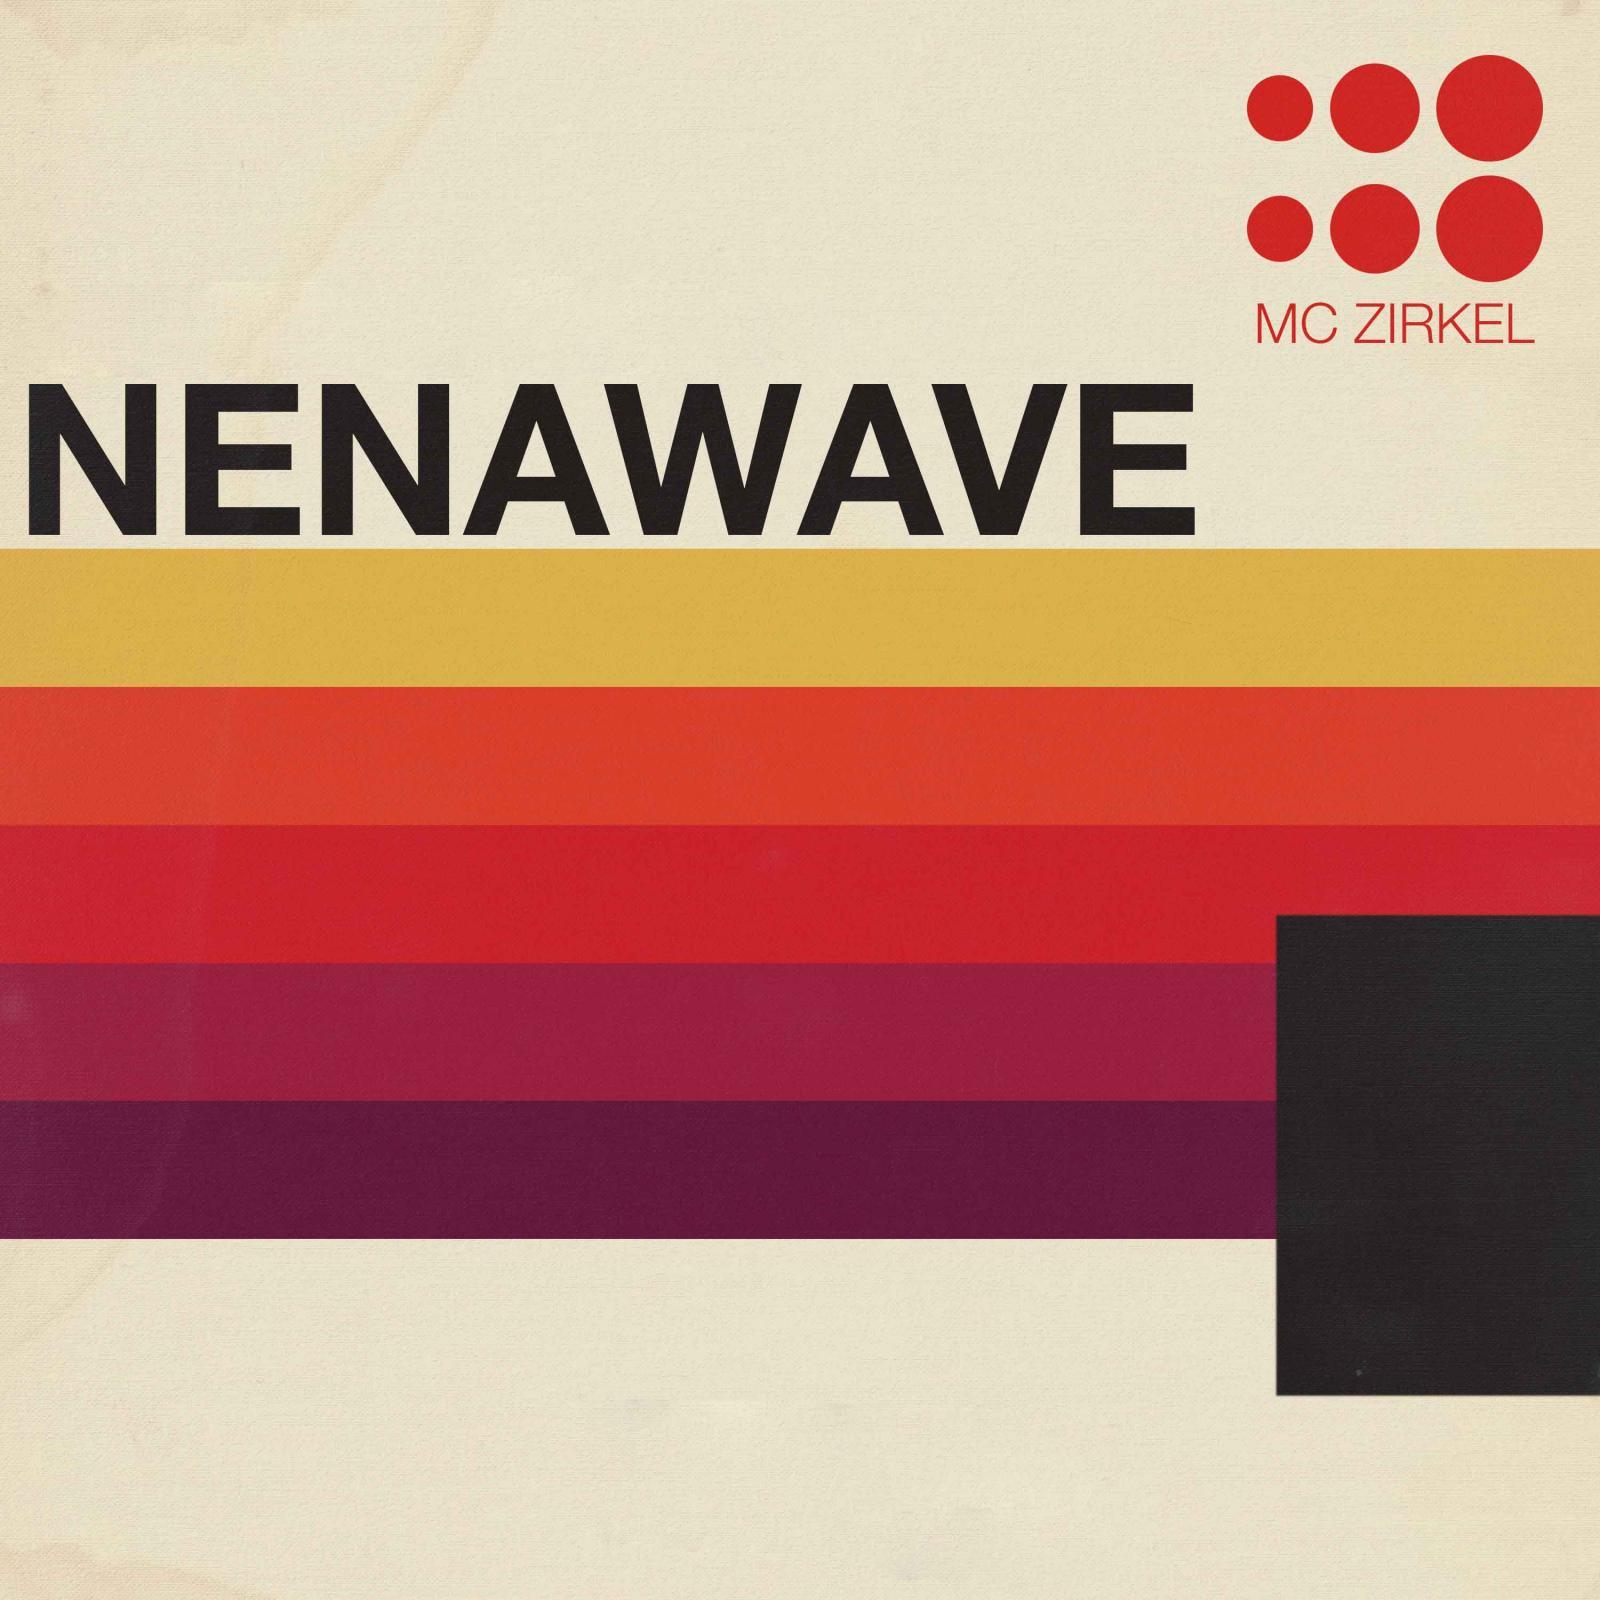 Upcoming: MC Zirkel - Nenawave